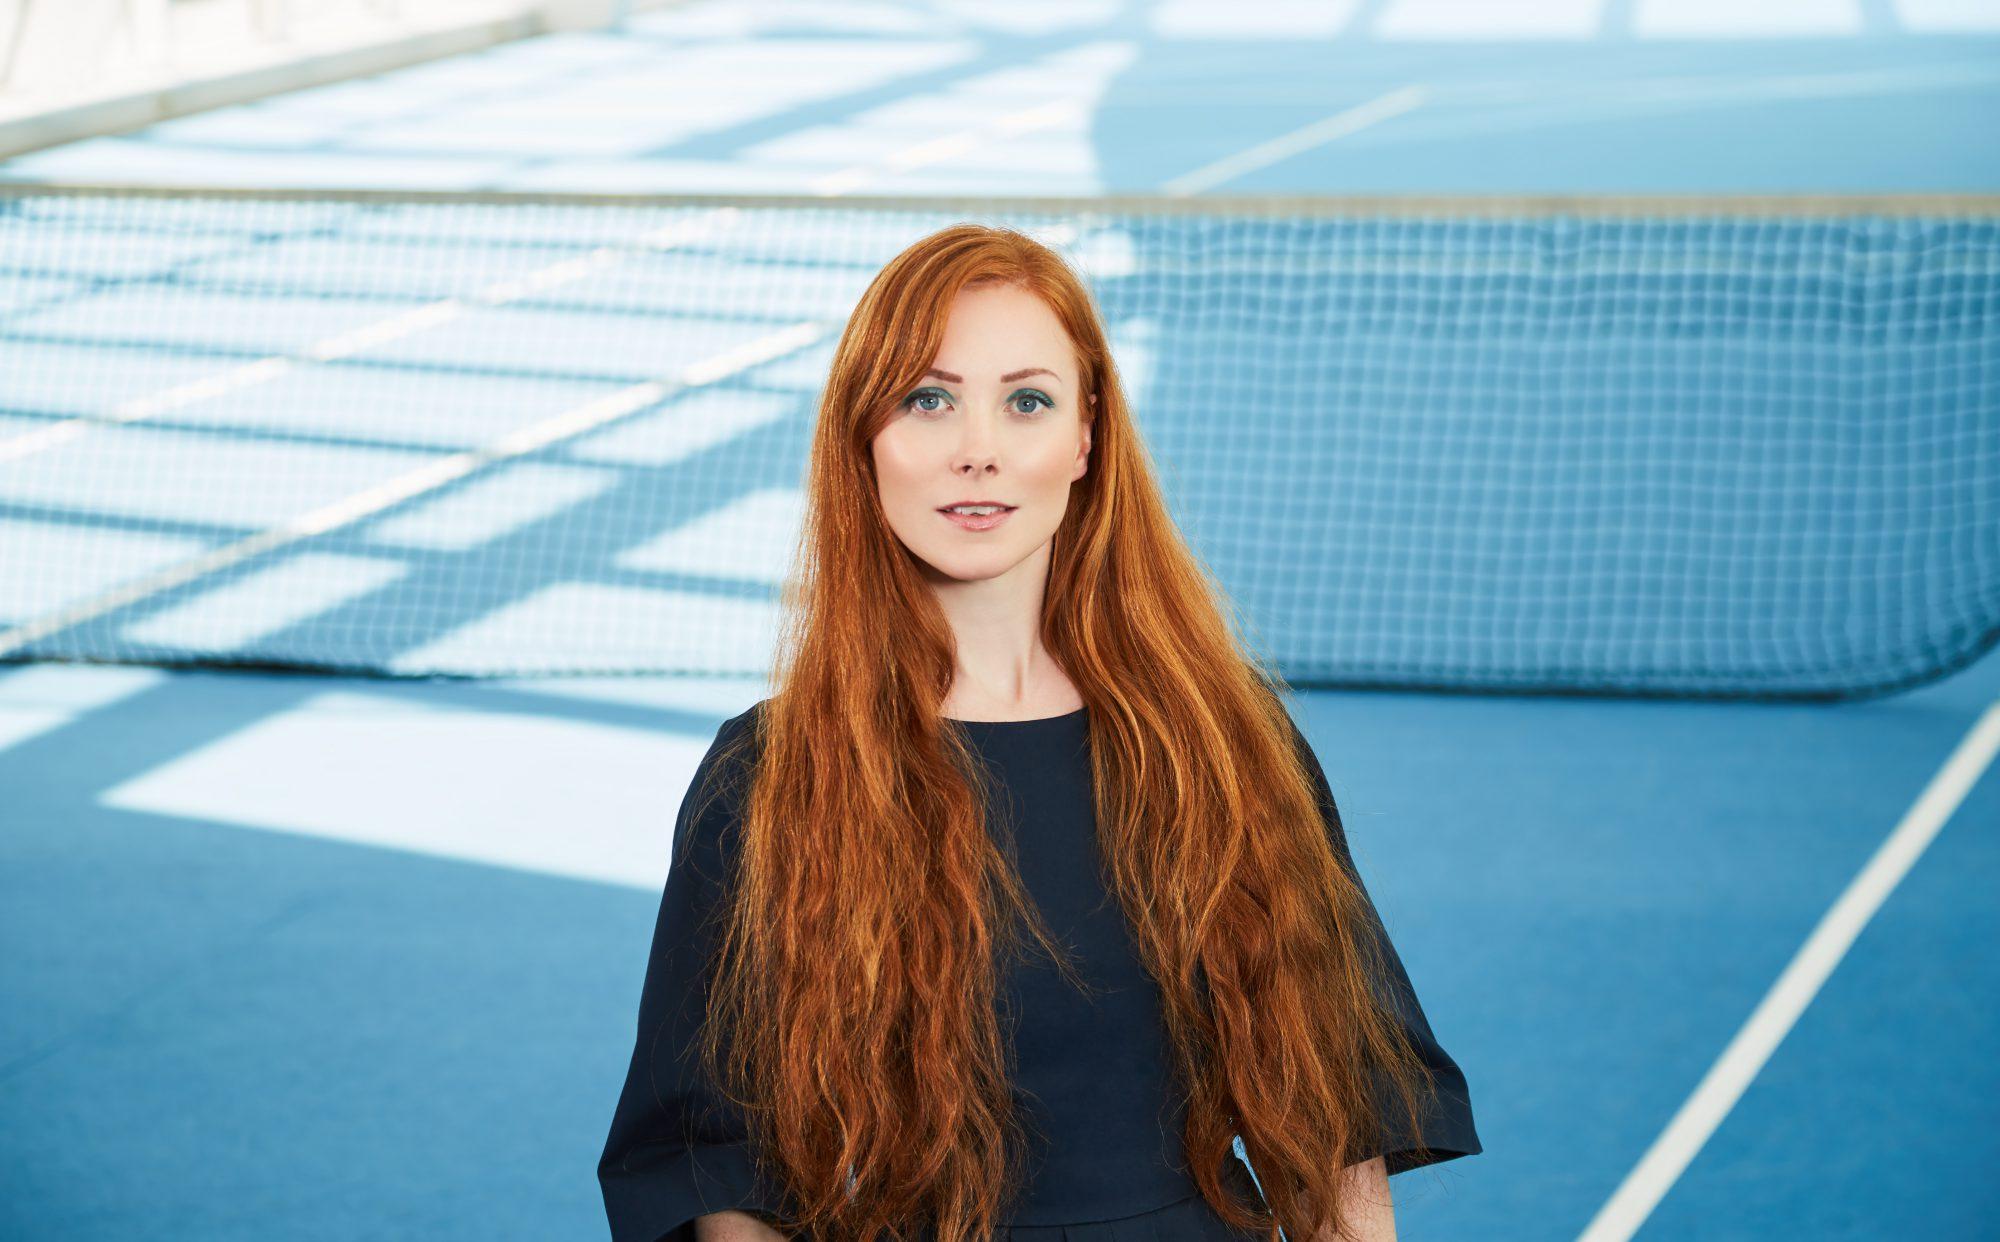 Hilde Annine Hasselberg